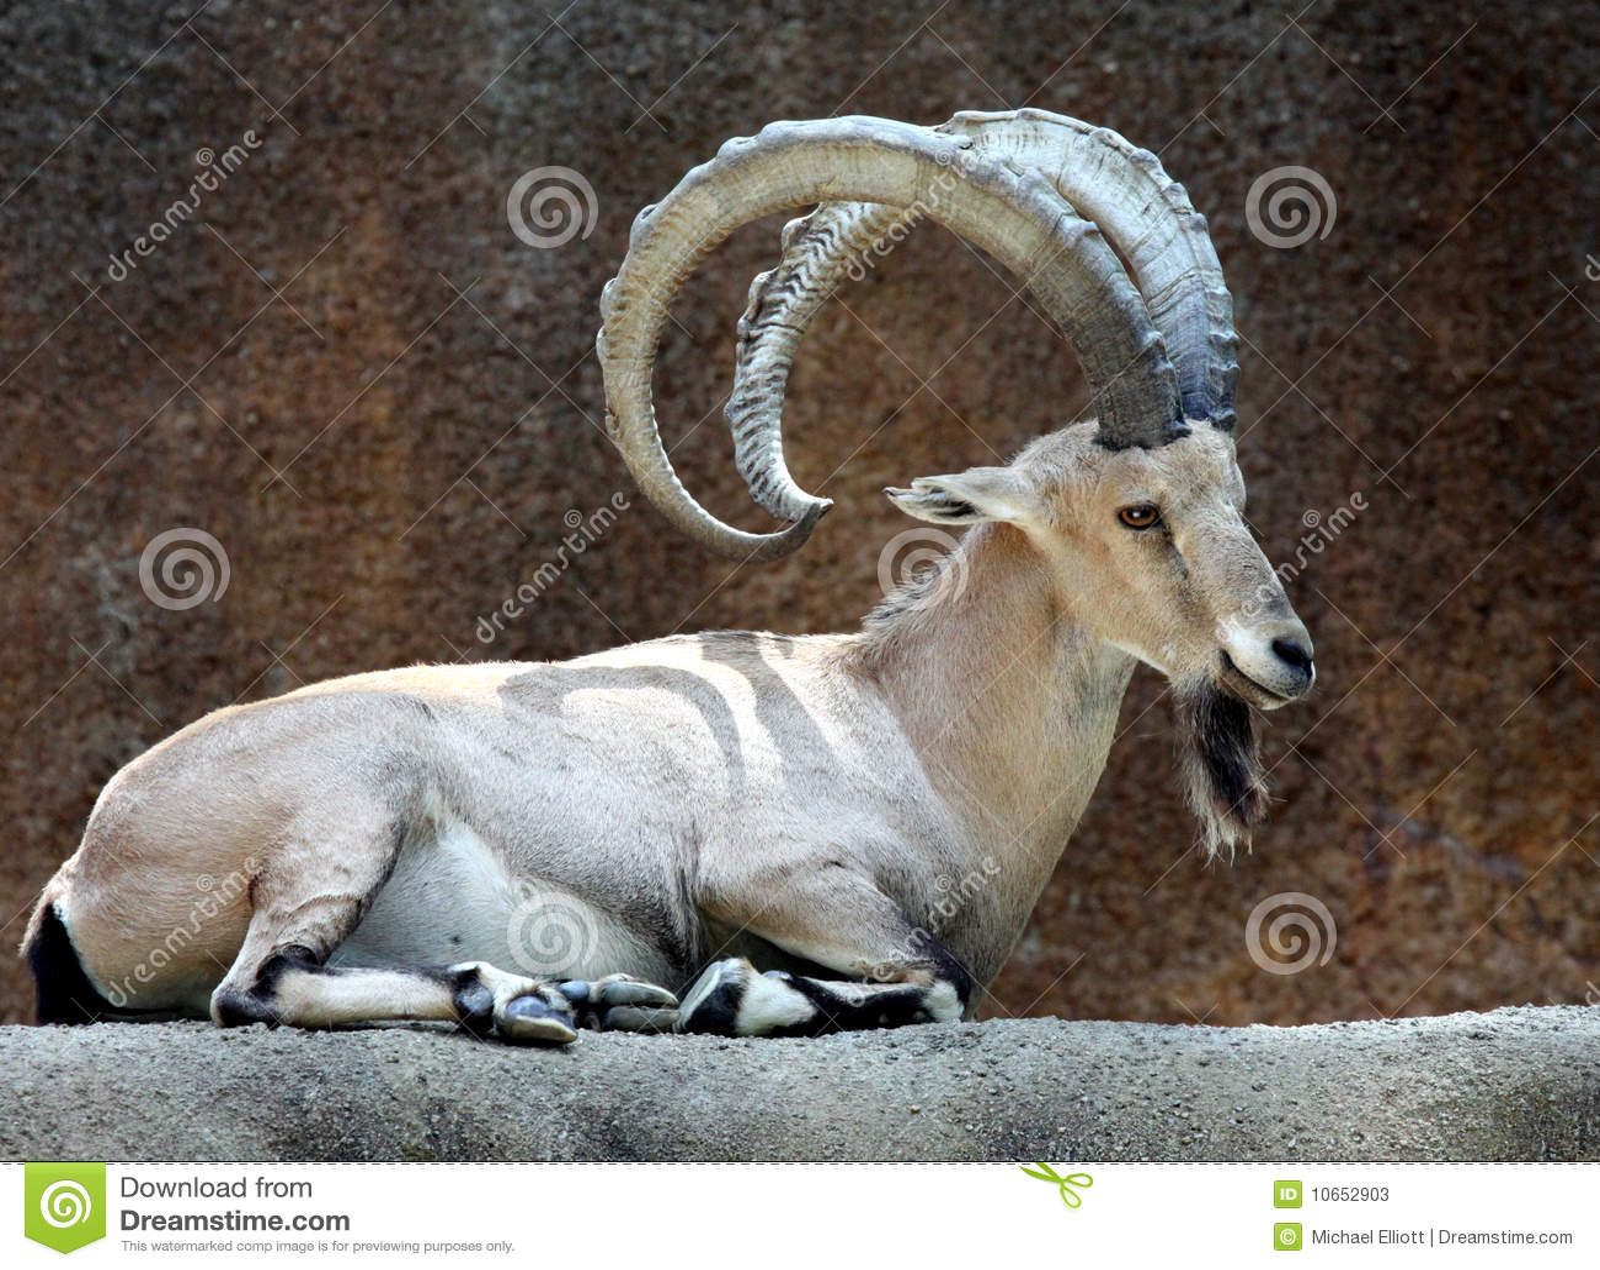 Animal Print Wallpaper Hd Ibex Goat Stock Image Image Of Creature Nature Hoofed